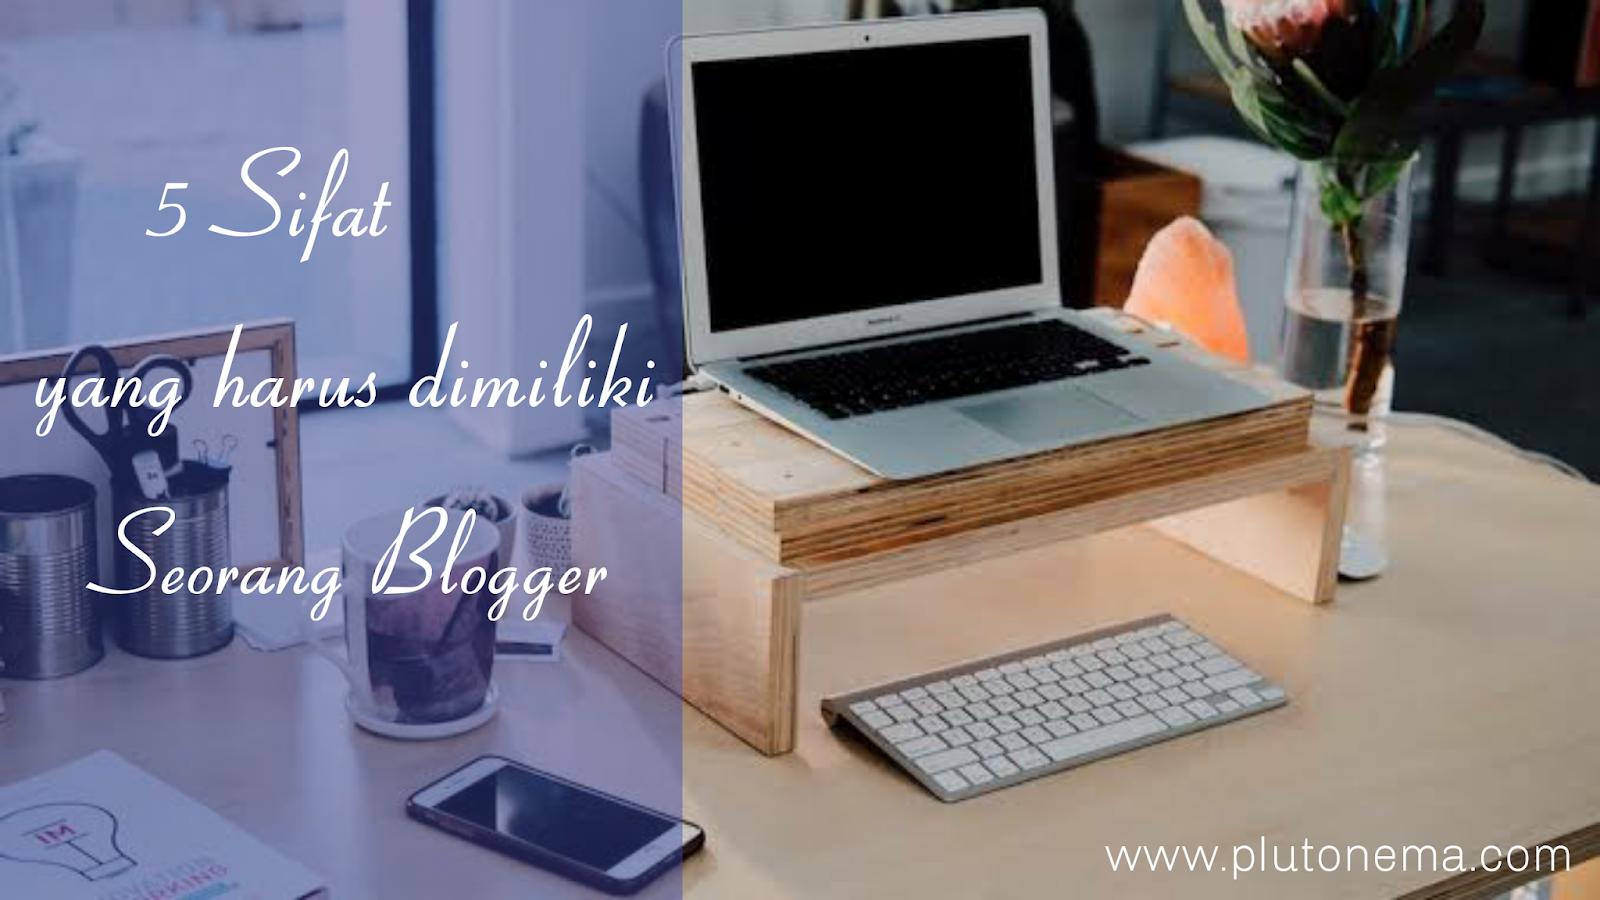 5 sifat yang harus dimiliki oleh seorang blogger, 5 sifat yang harus diterapkan bagi blogger pemula, tips ngeblog, cara menjadi seorang blogger sukses, bagaimana menjadi seorang blogger sukses,